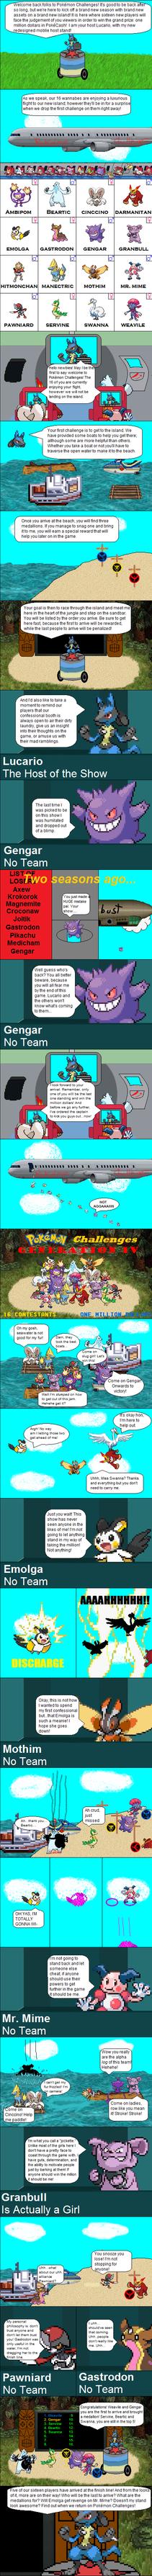 Pokemon Challenges Gen IV Ep 1 - Part 1 by pokemonmanic3595